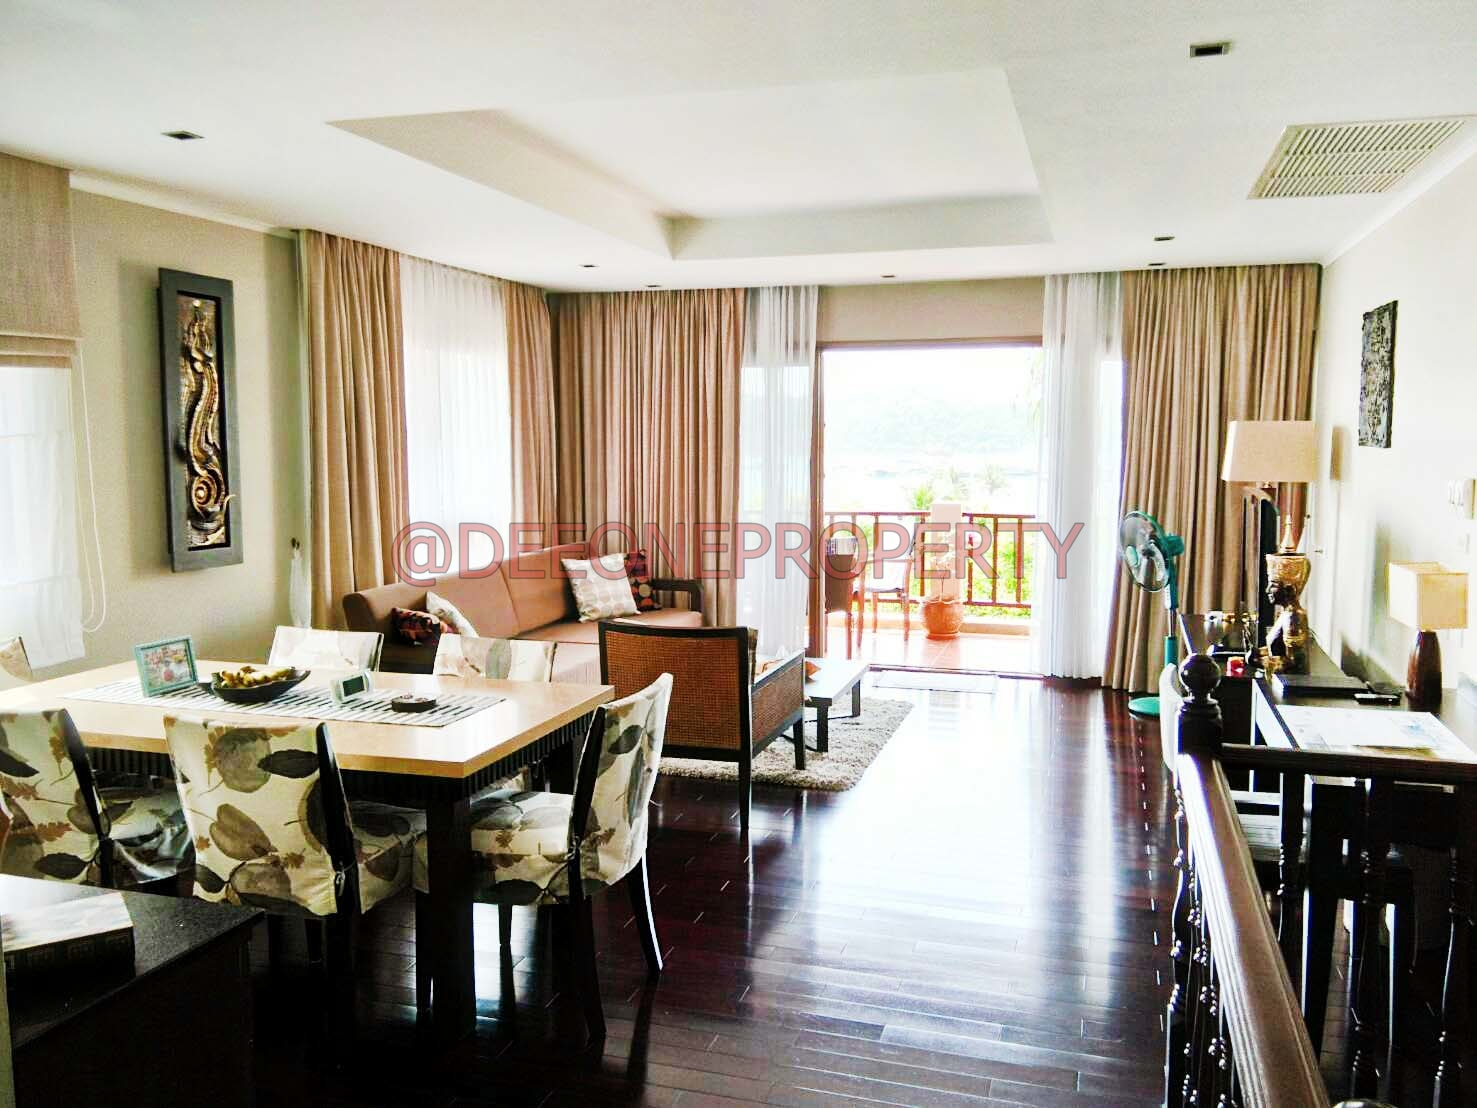 Stunning 2 Bedroom Duplex Condo Sea View for Sale – Klong Koi, Koh Chang